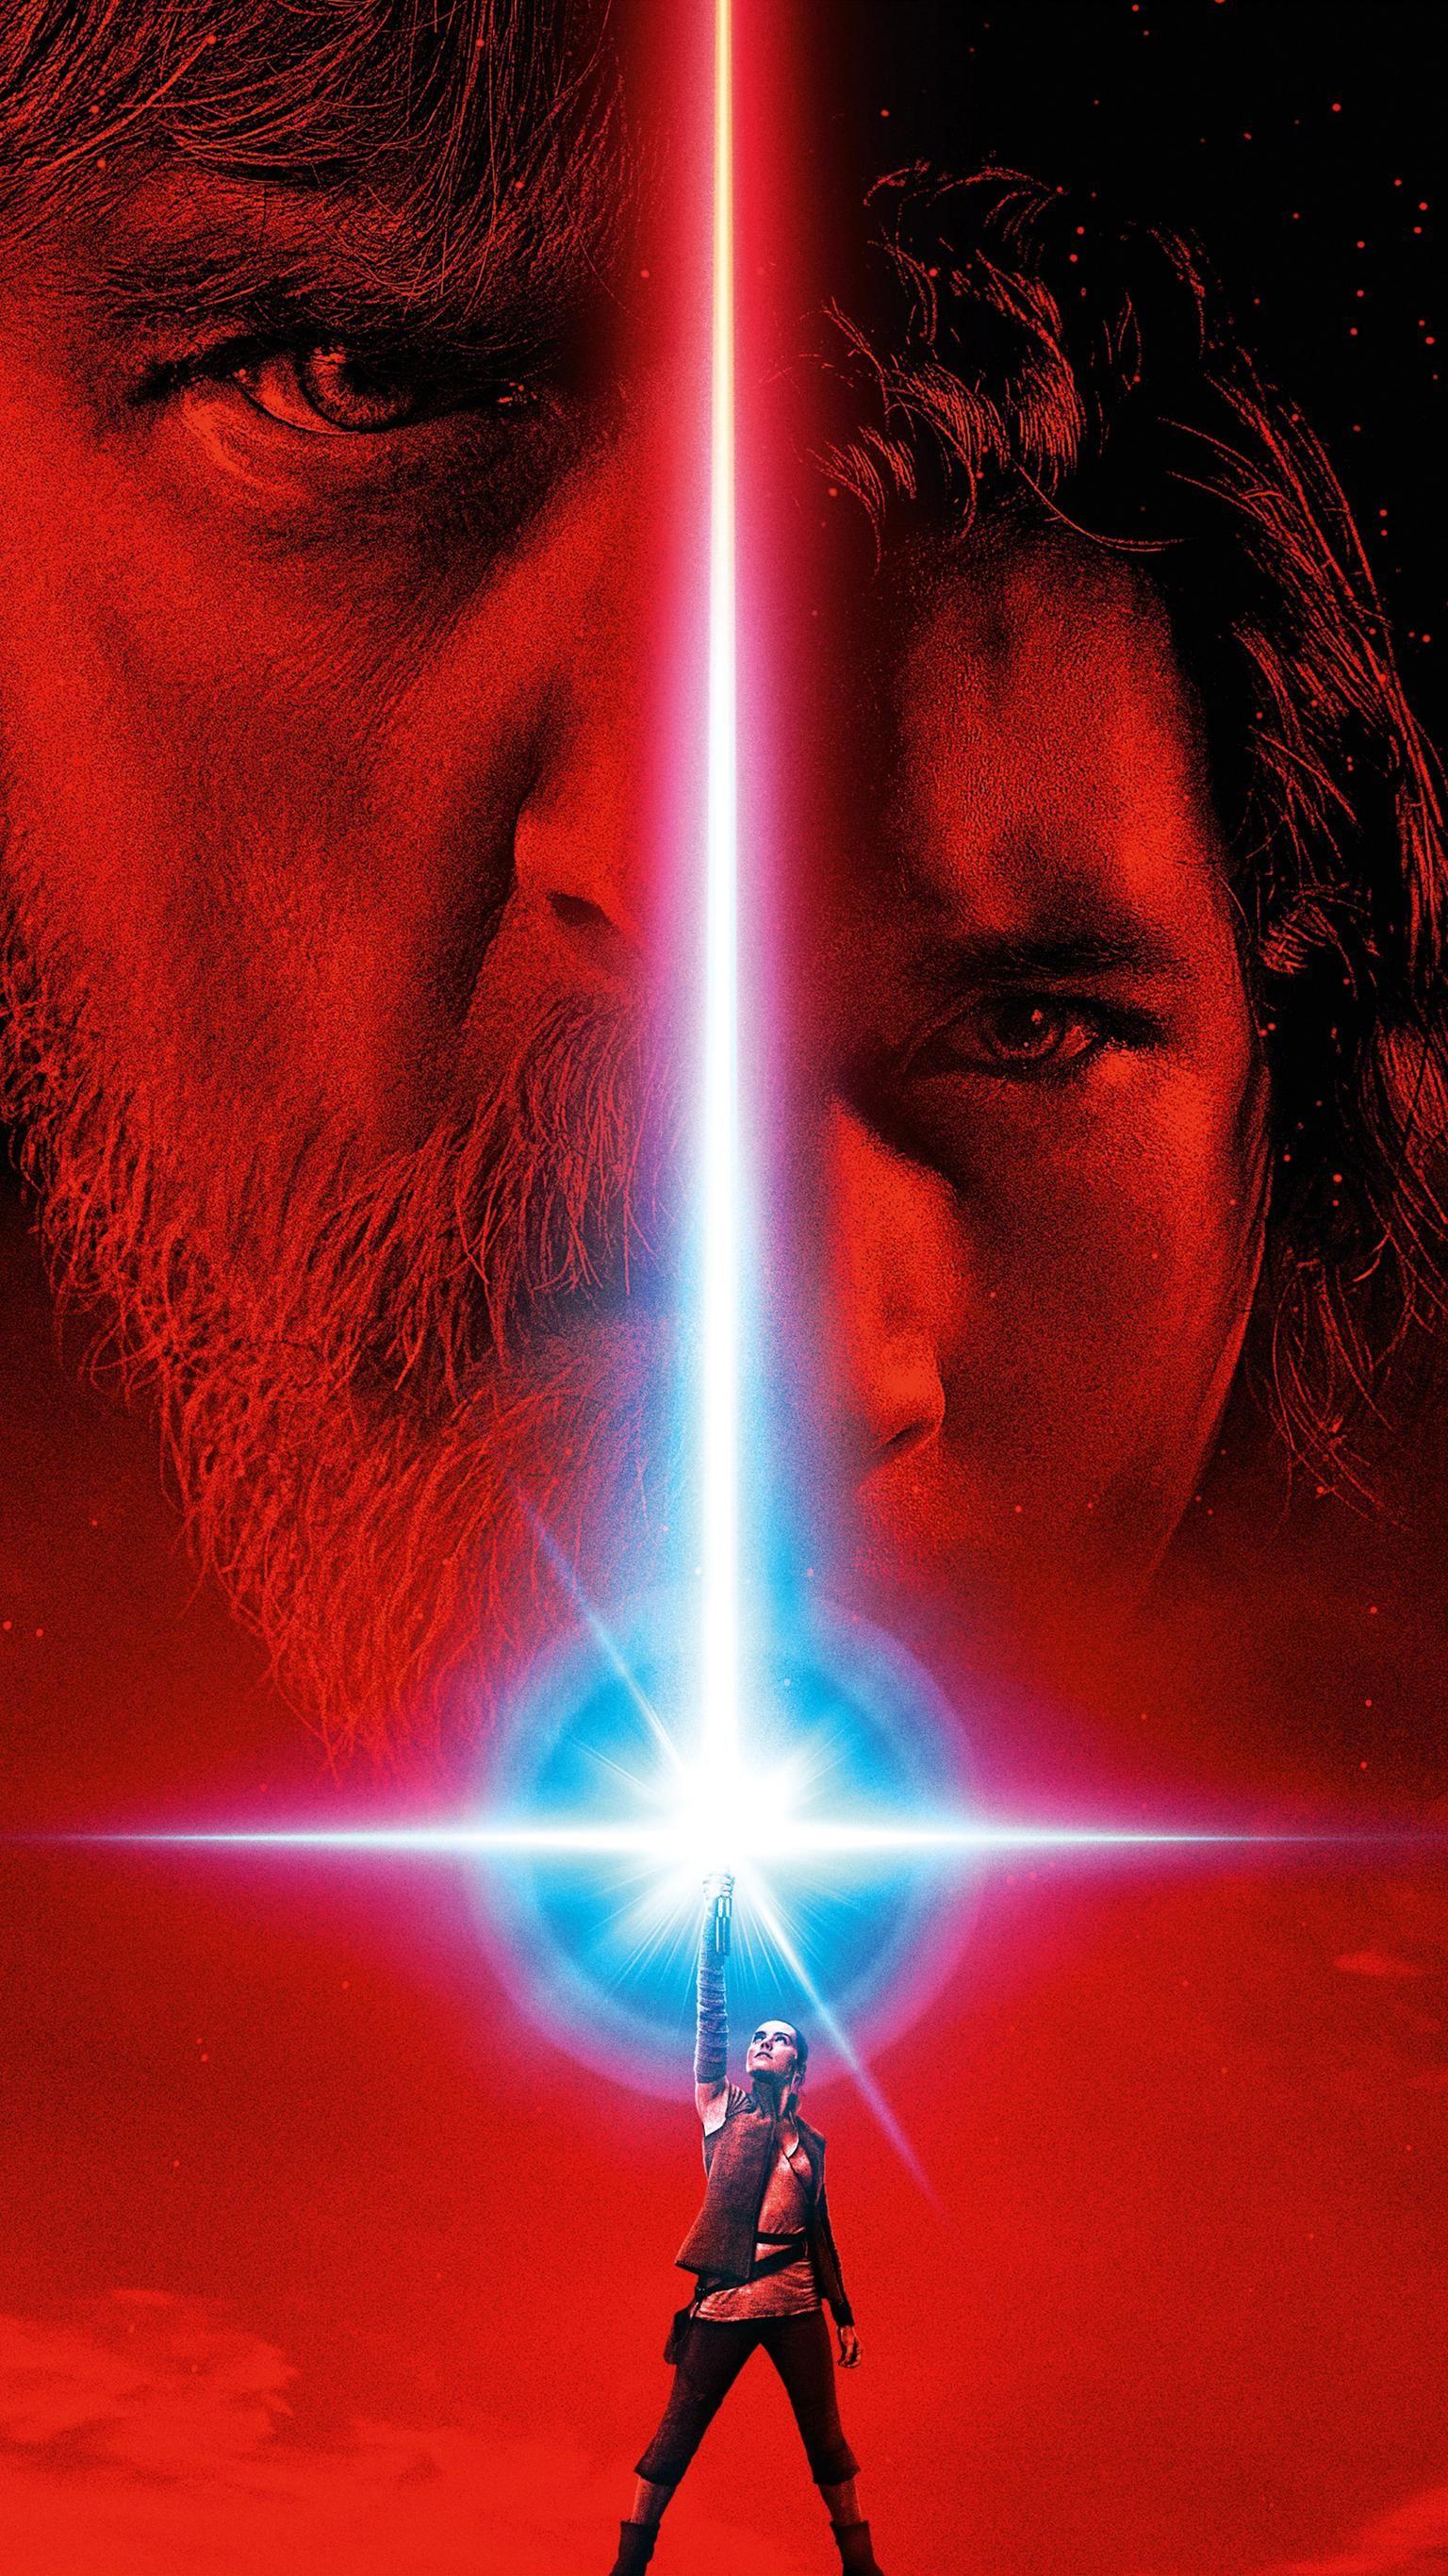 Star Wars The Last Jedi 2017 Phone Wallpaper Moviemania In 2020 Star Wars Wallpaper Star Wars Wallpaper Iphone Star Wars Background